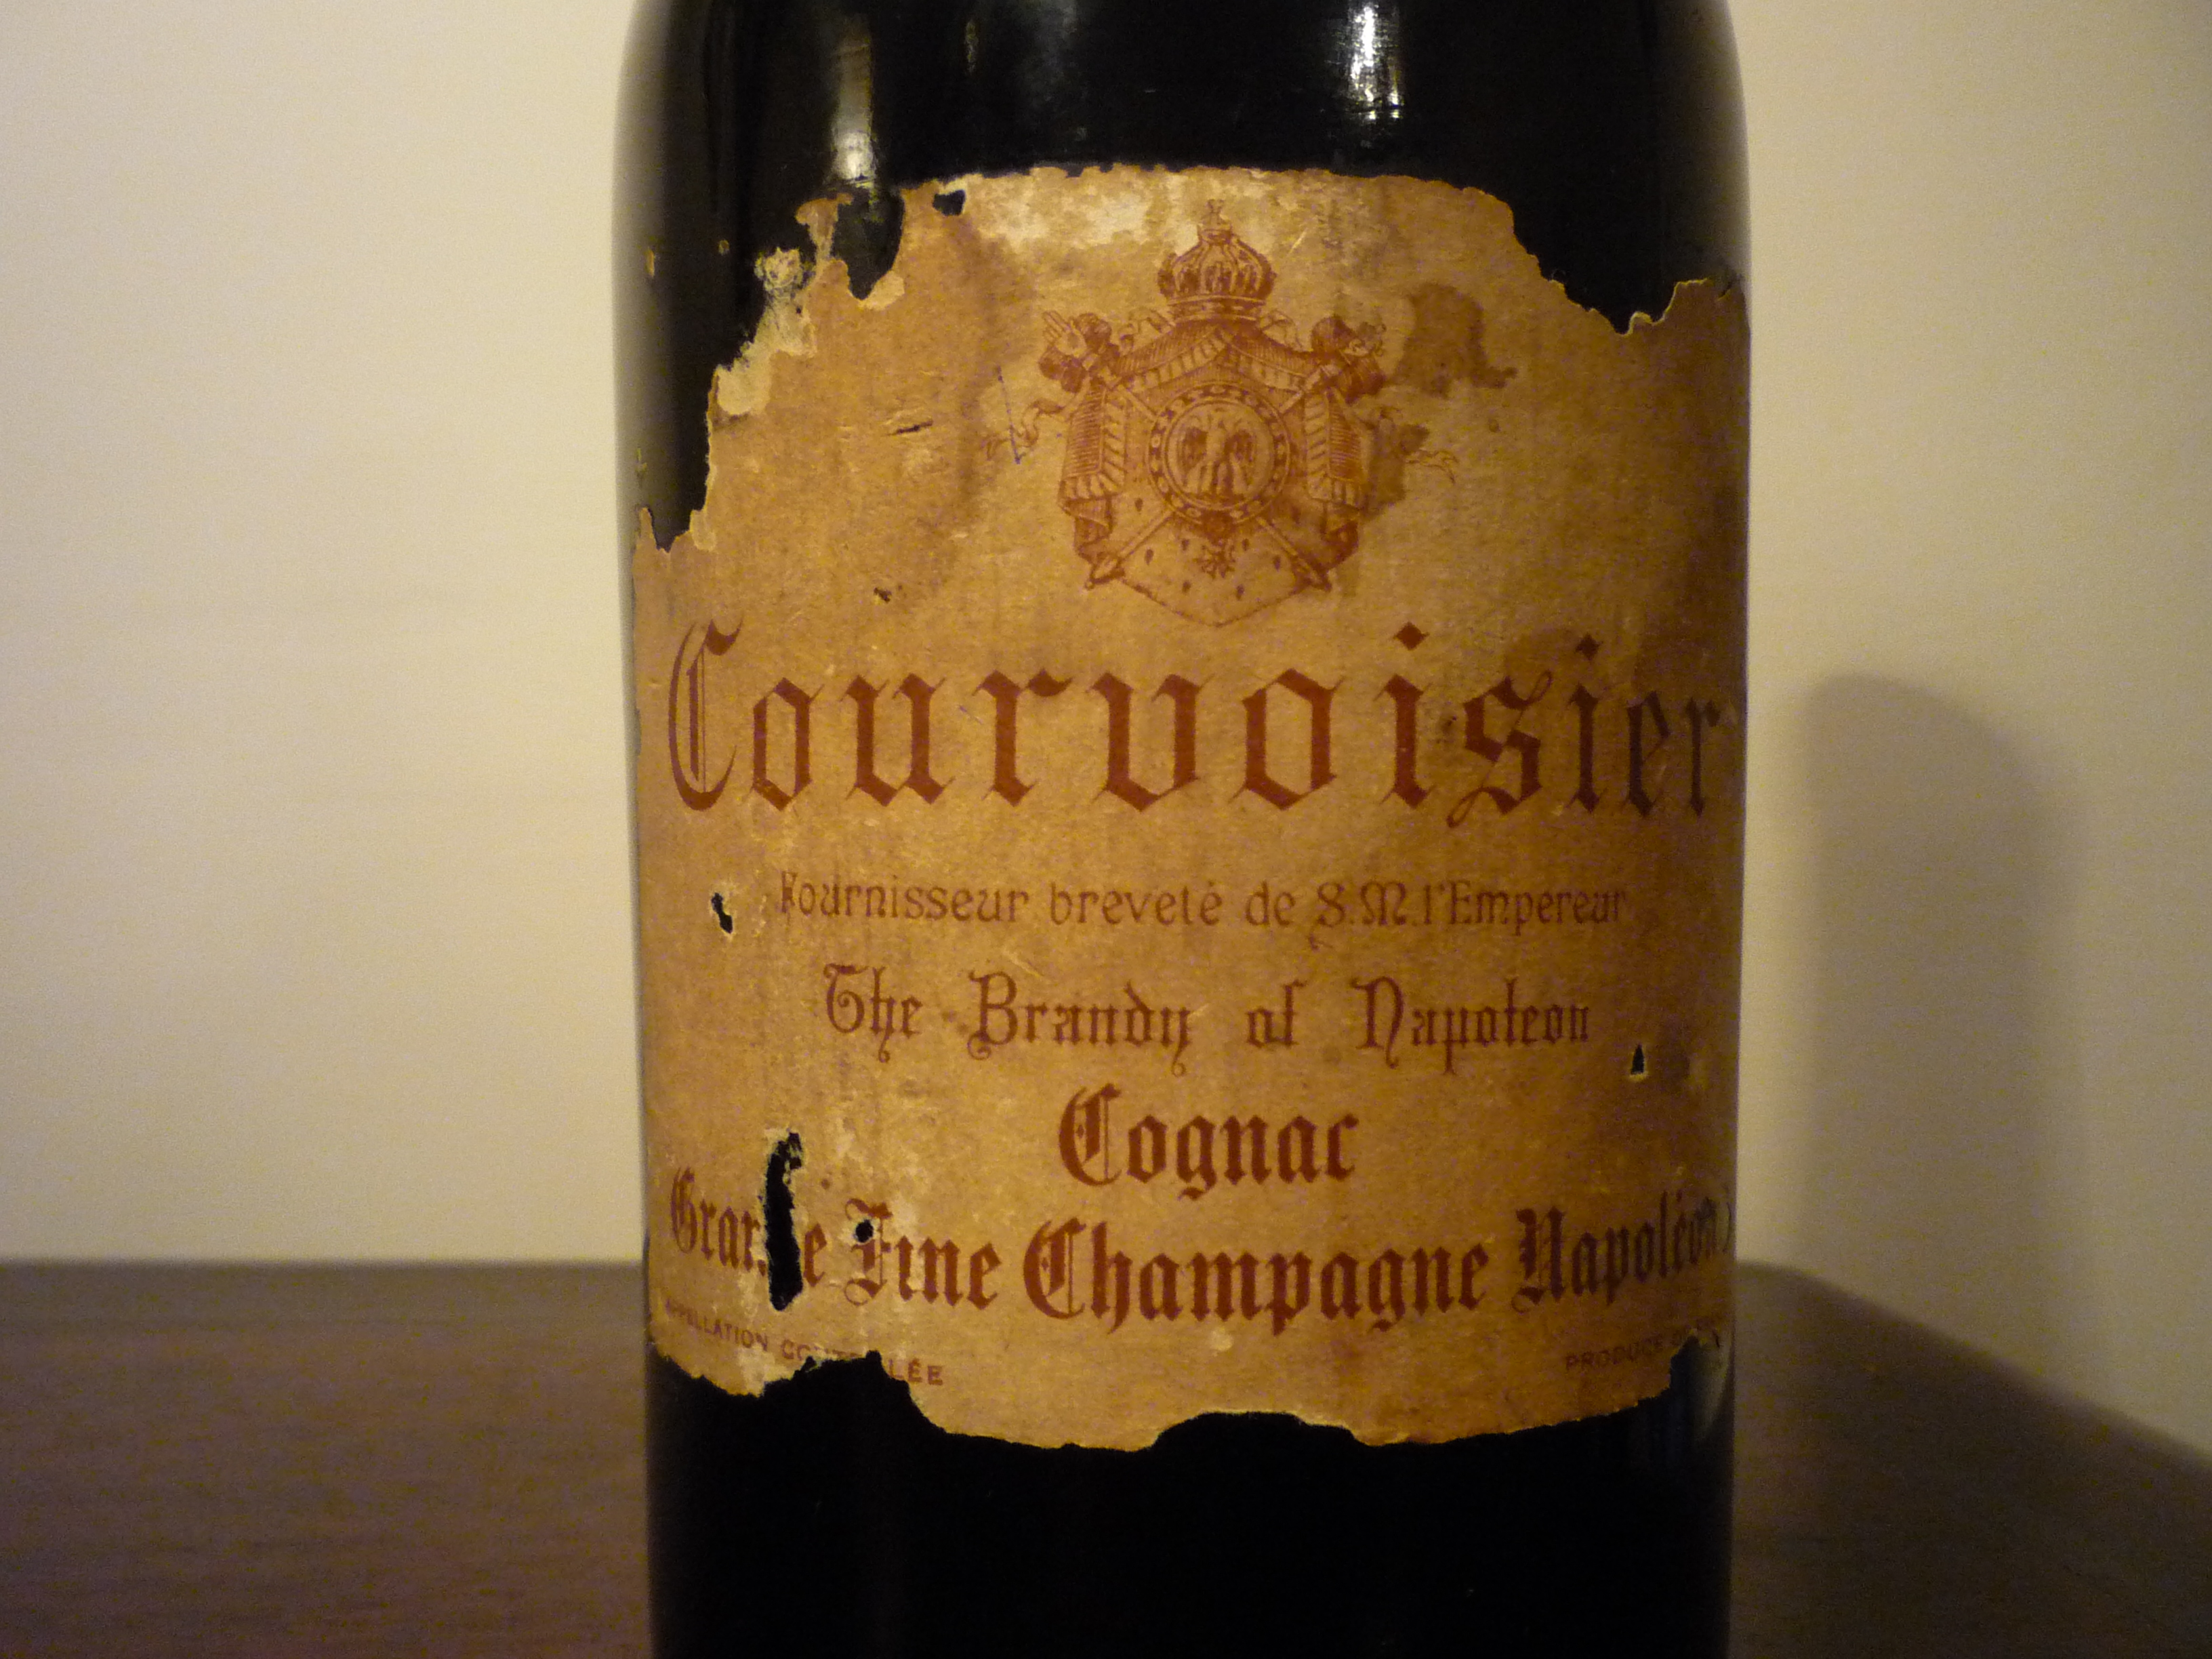 Symptom Courvoisier: manifestations and help